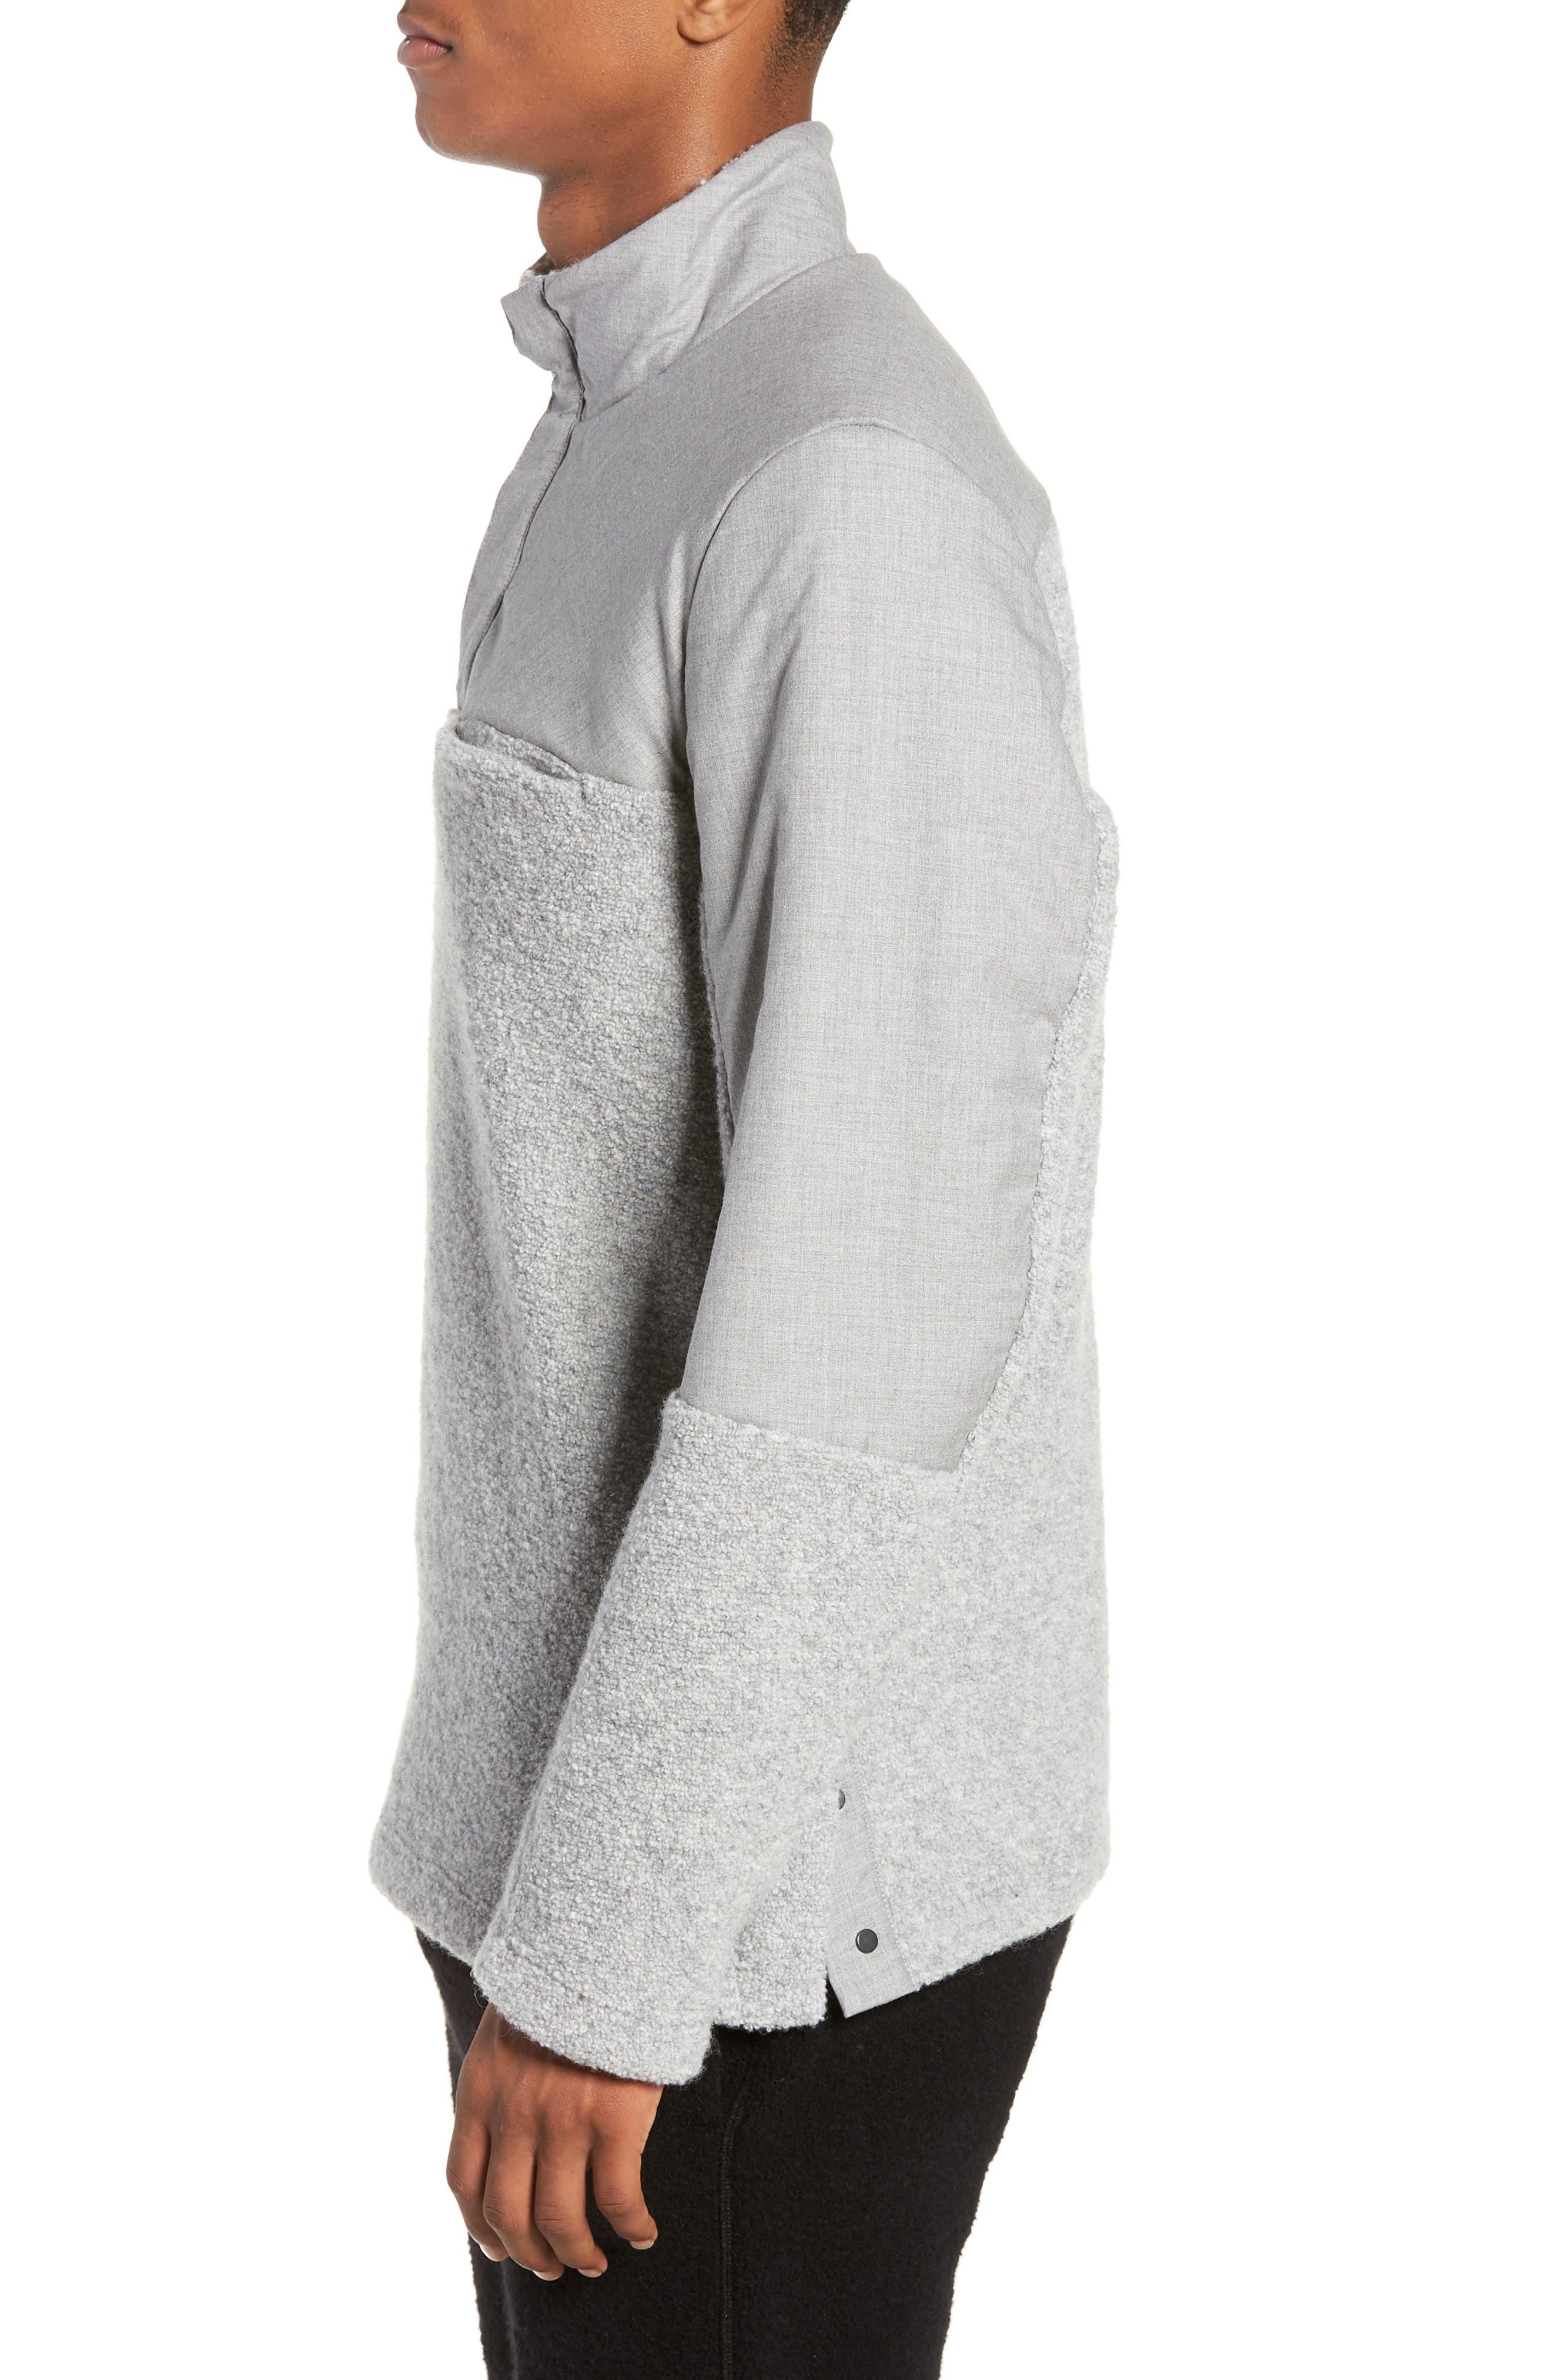 Tactical Fleece Pullover,                             Alternate thumbnail 3, color,                             HEATHER GREY